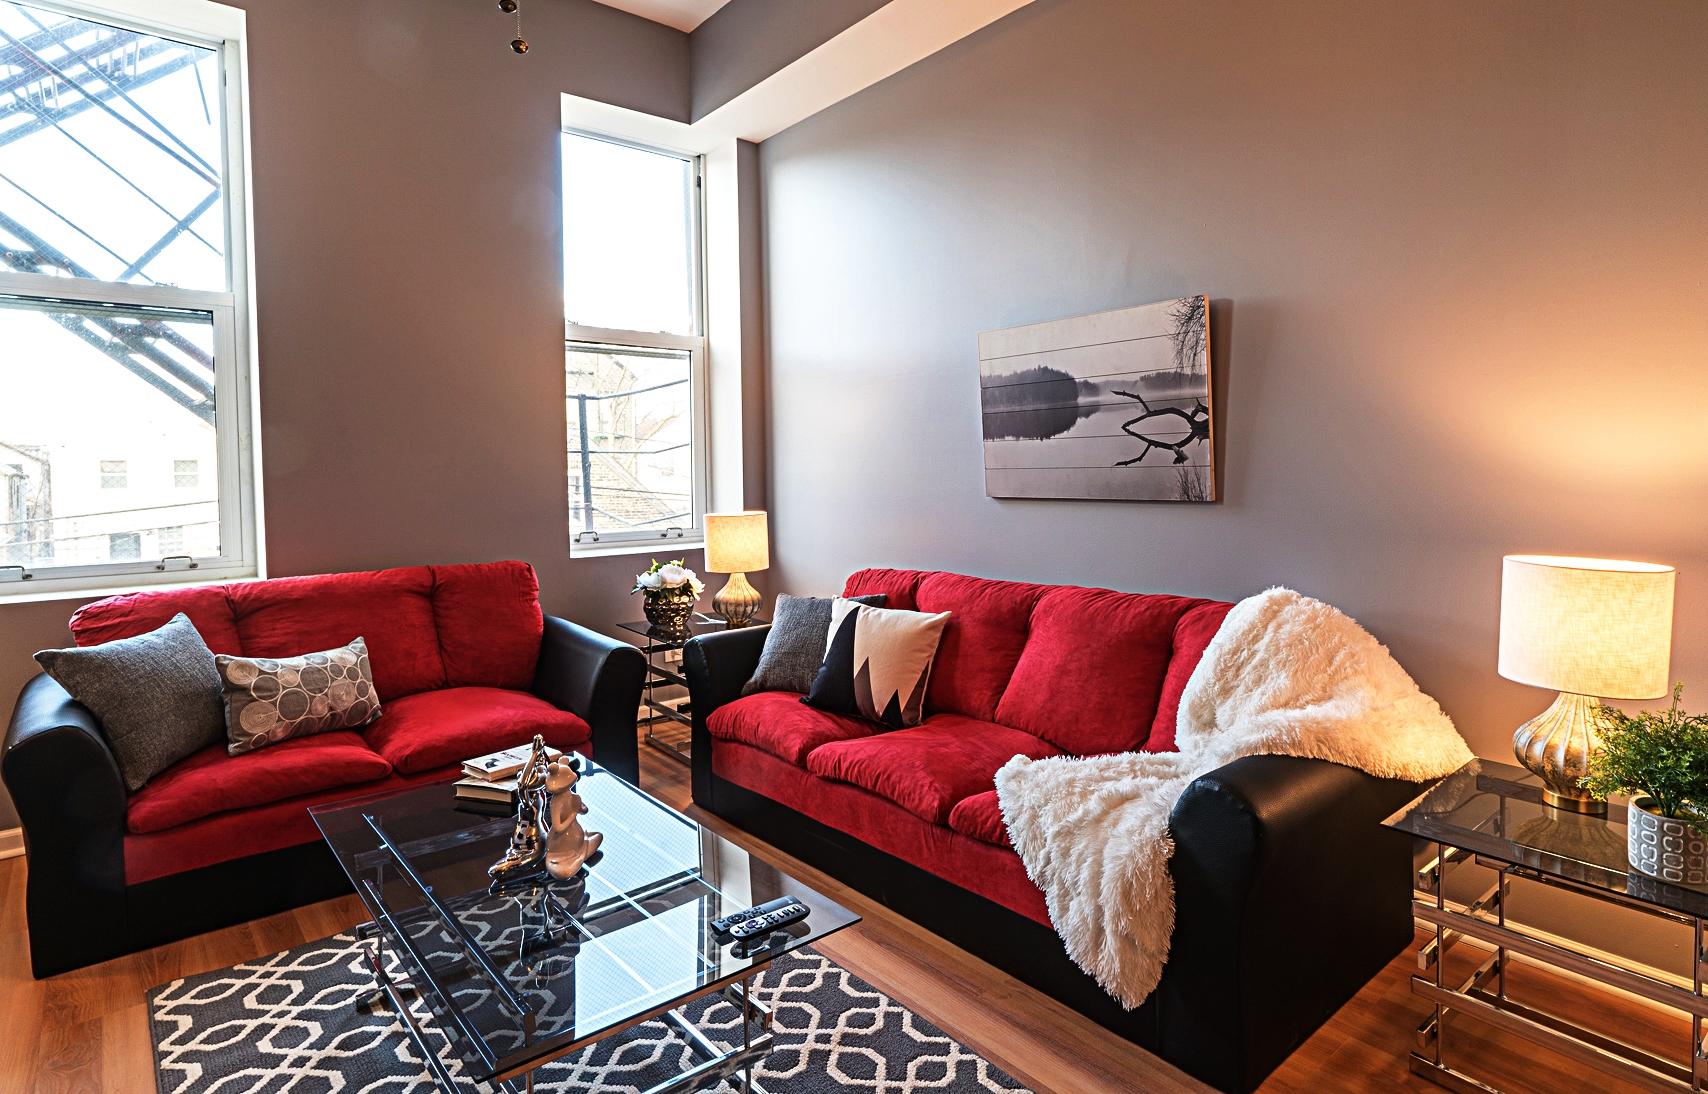 Nube Stratus Suite - Pilsen neighborhood - Chicago, IL